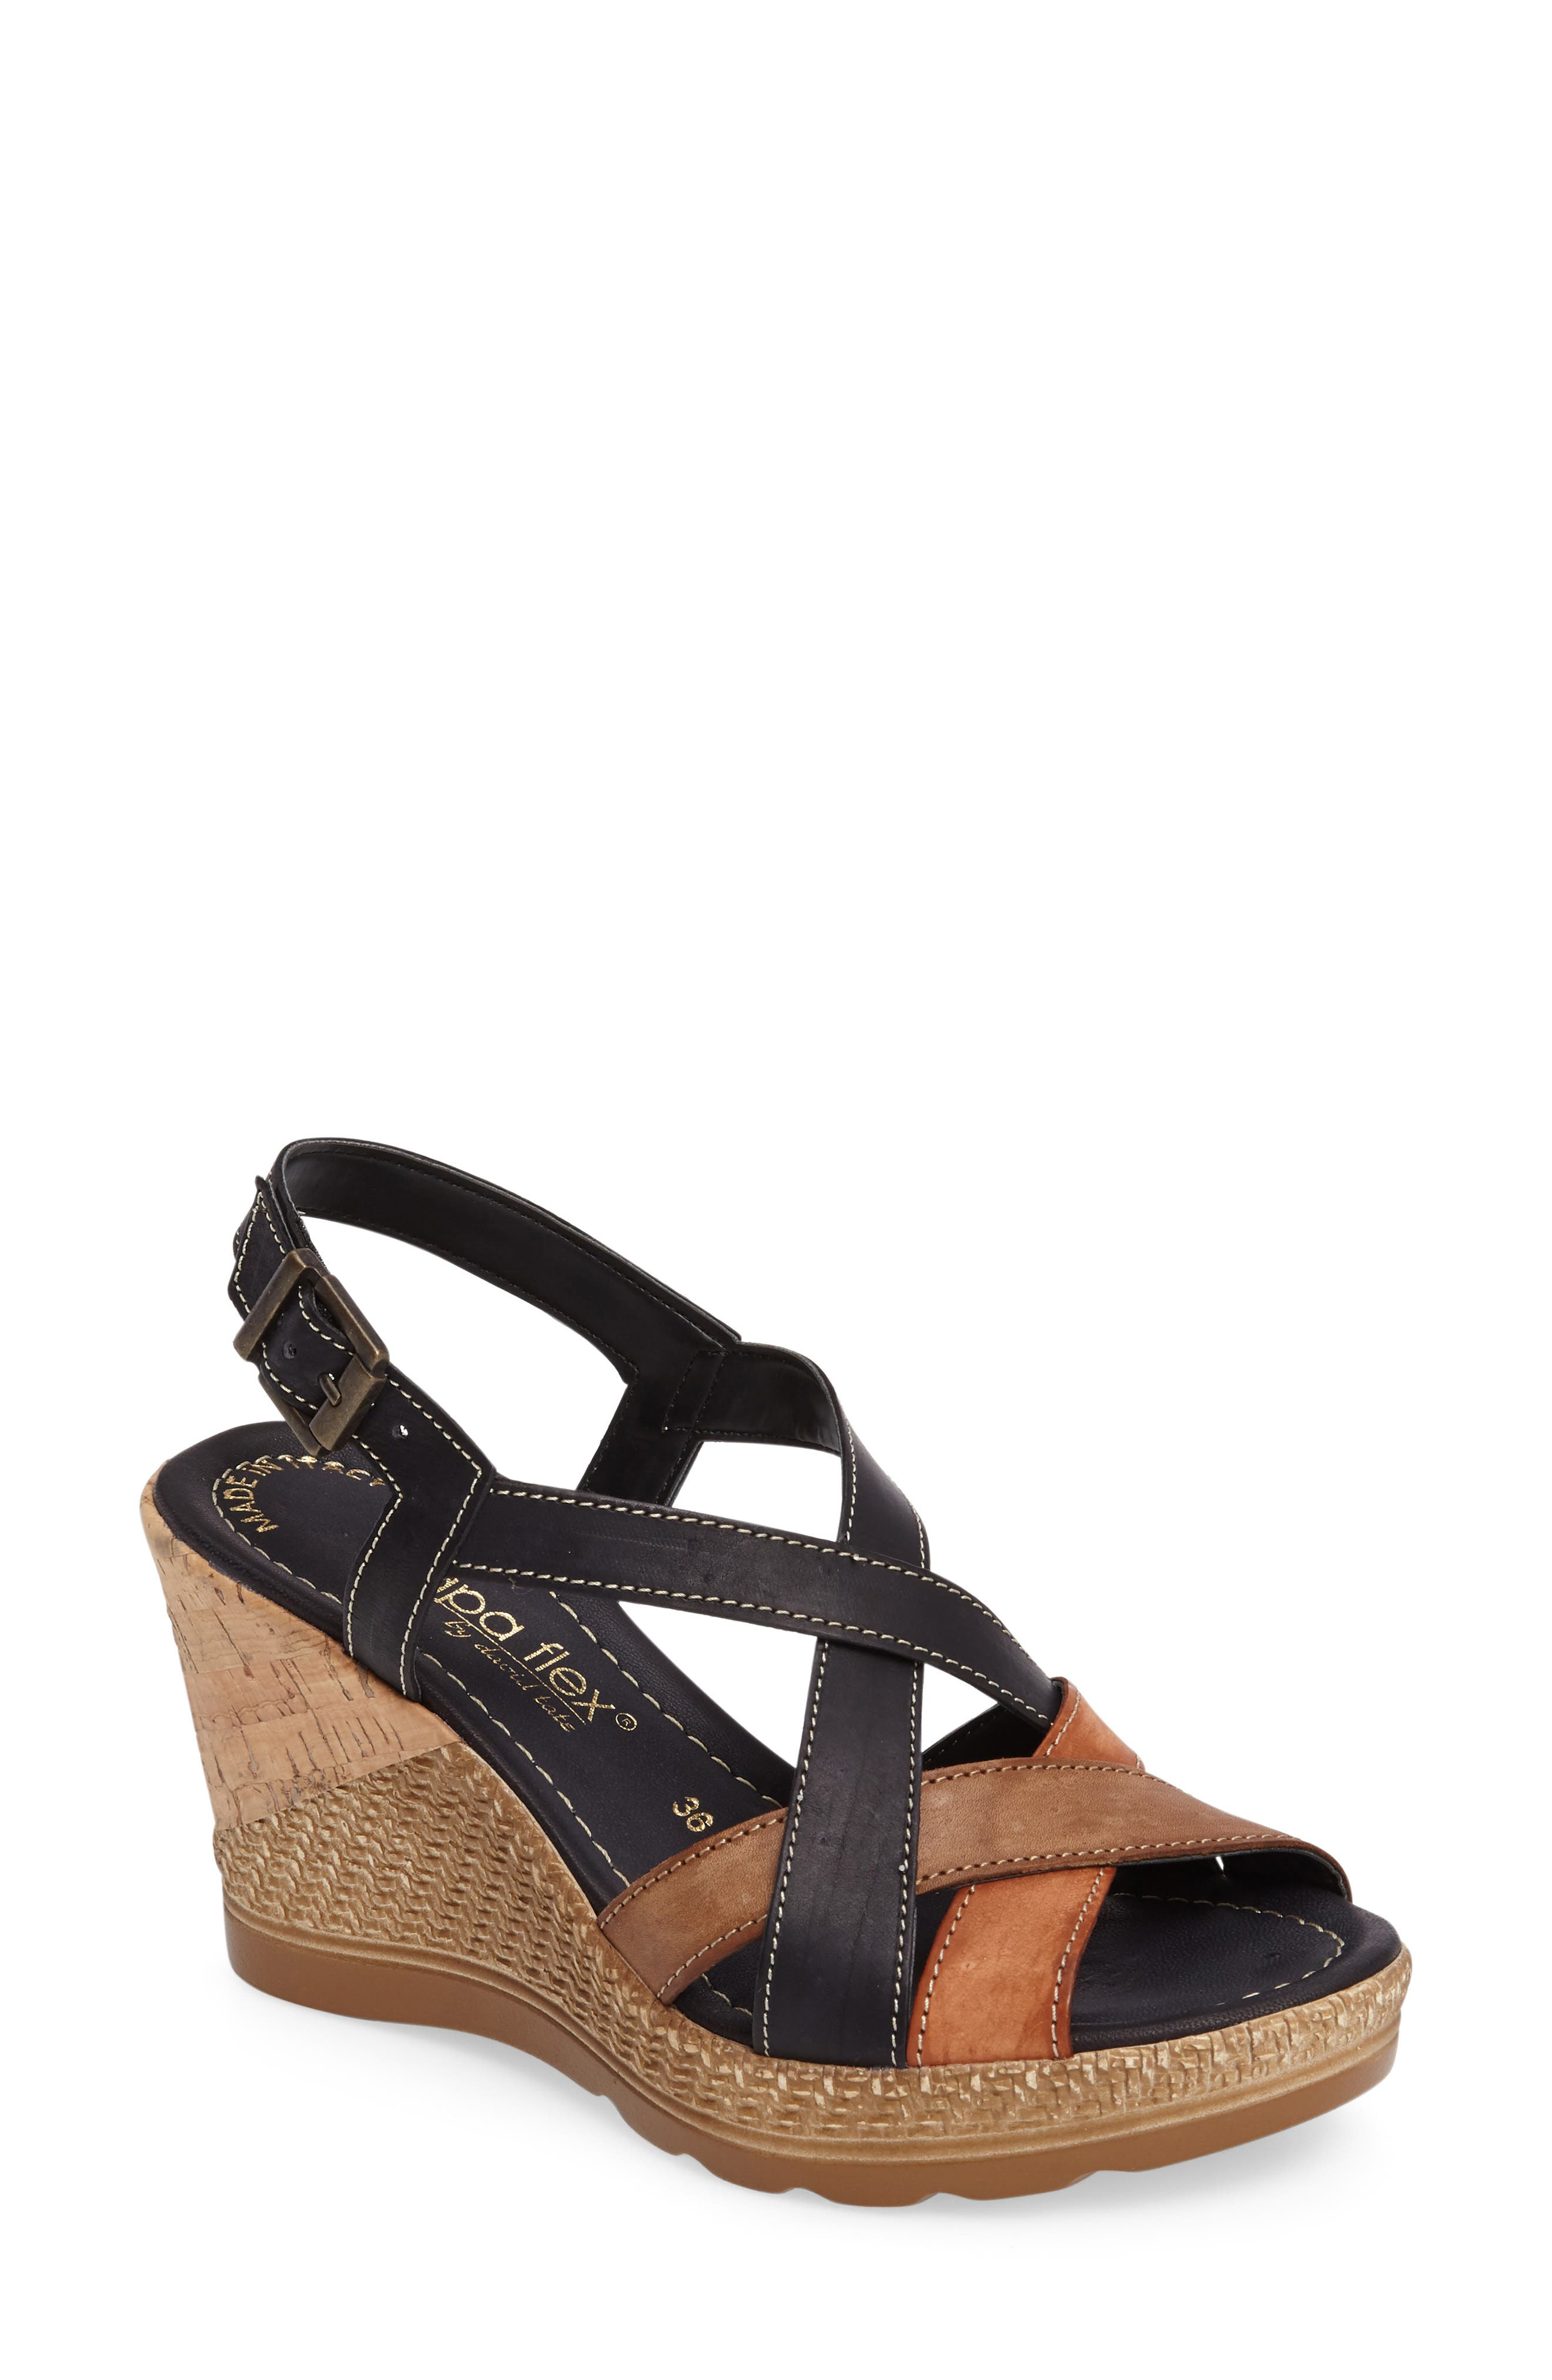 Modena Wedge Sandal,                         Main,                         color, 001